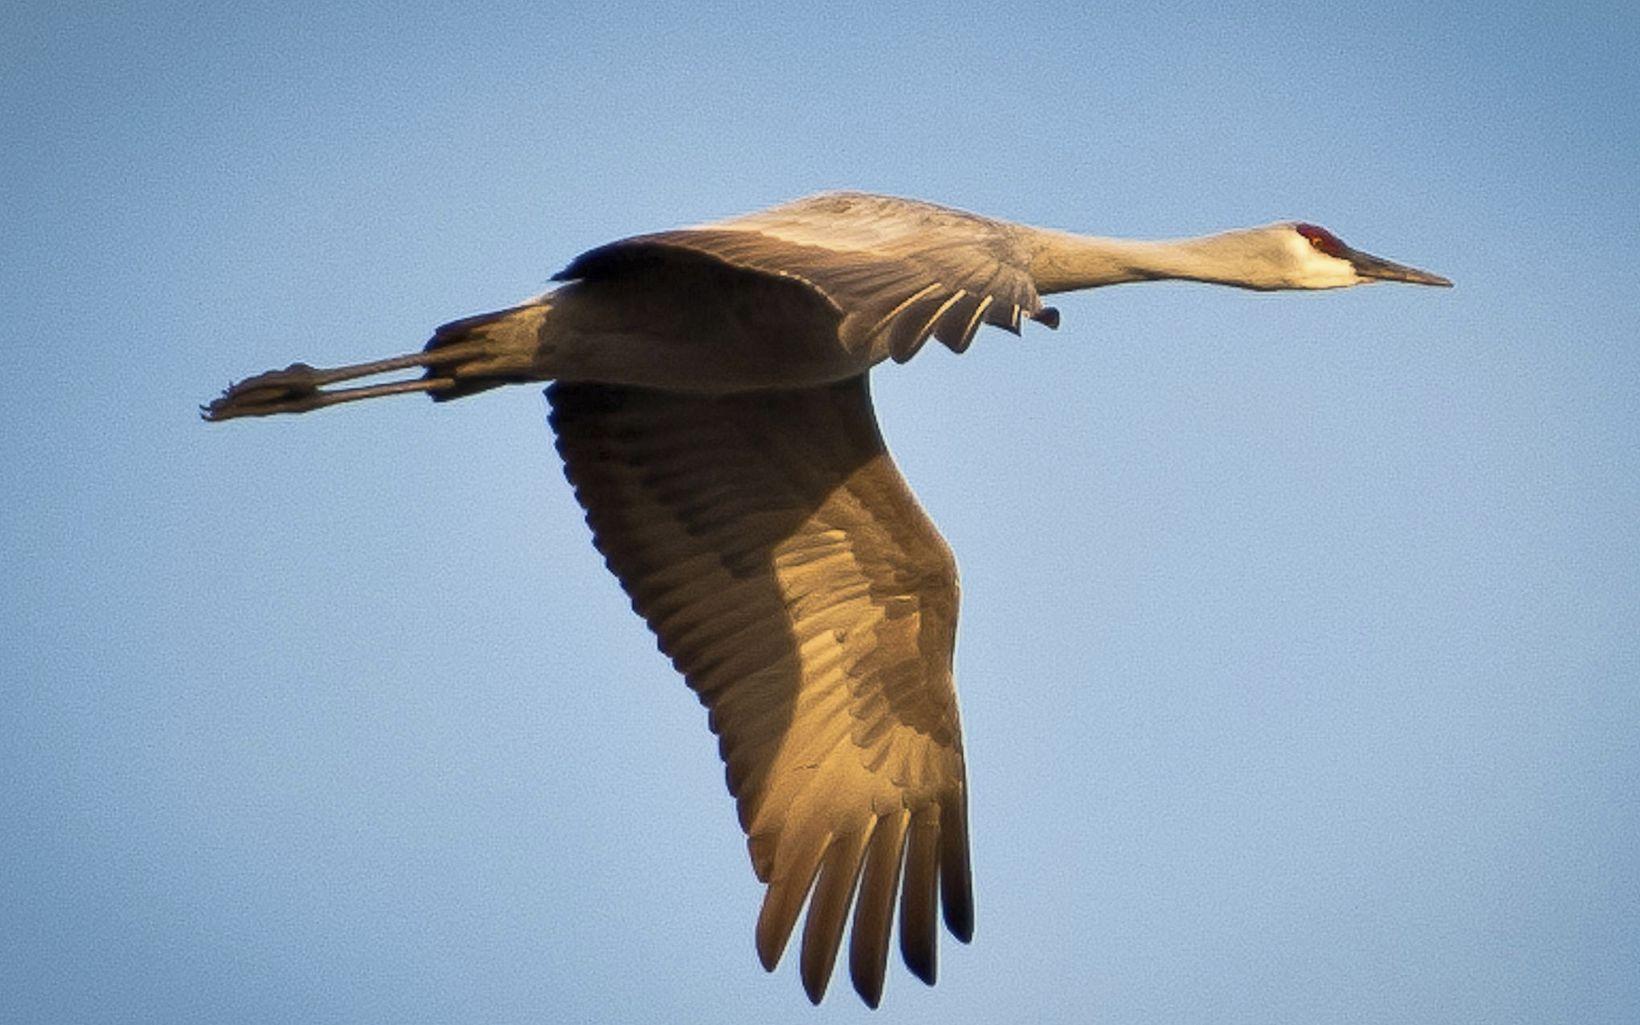 A solo sandhill crane flies across a blue sky.